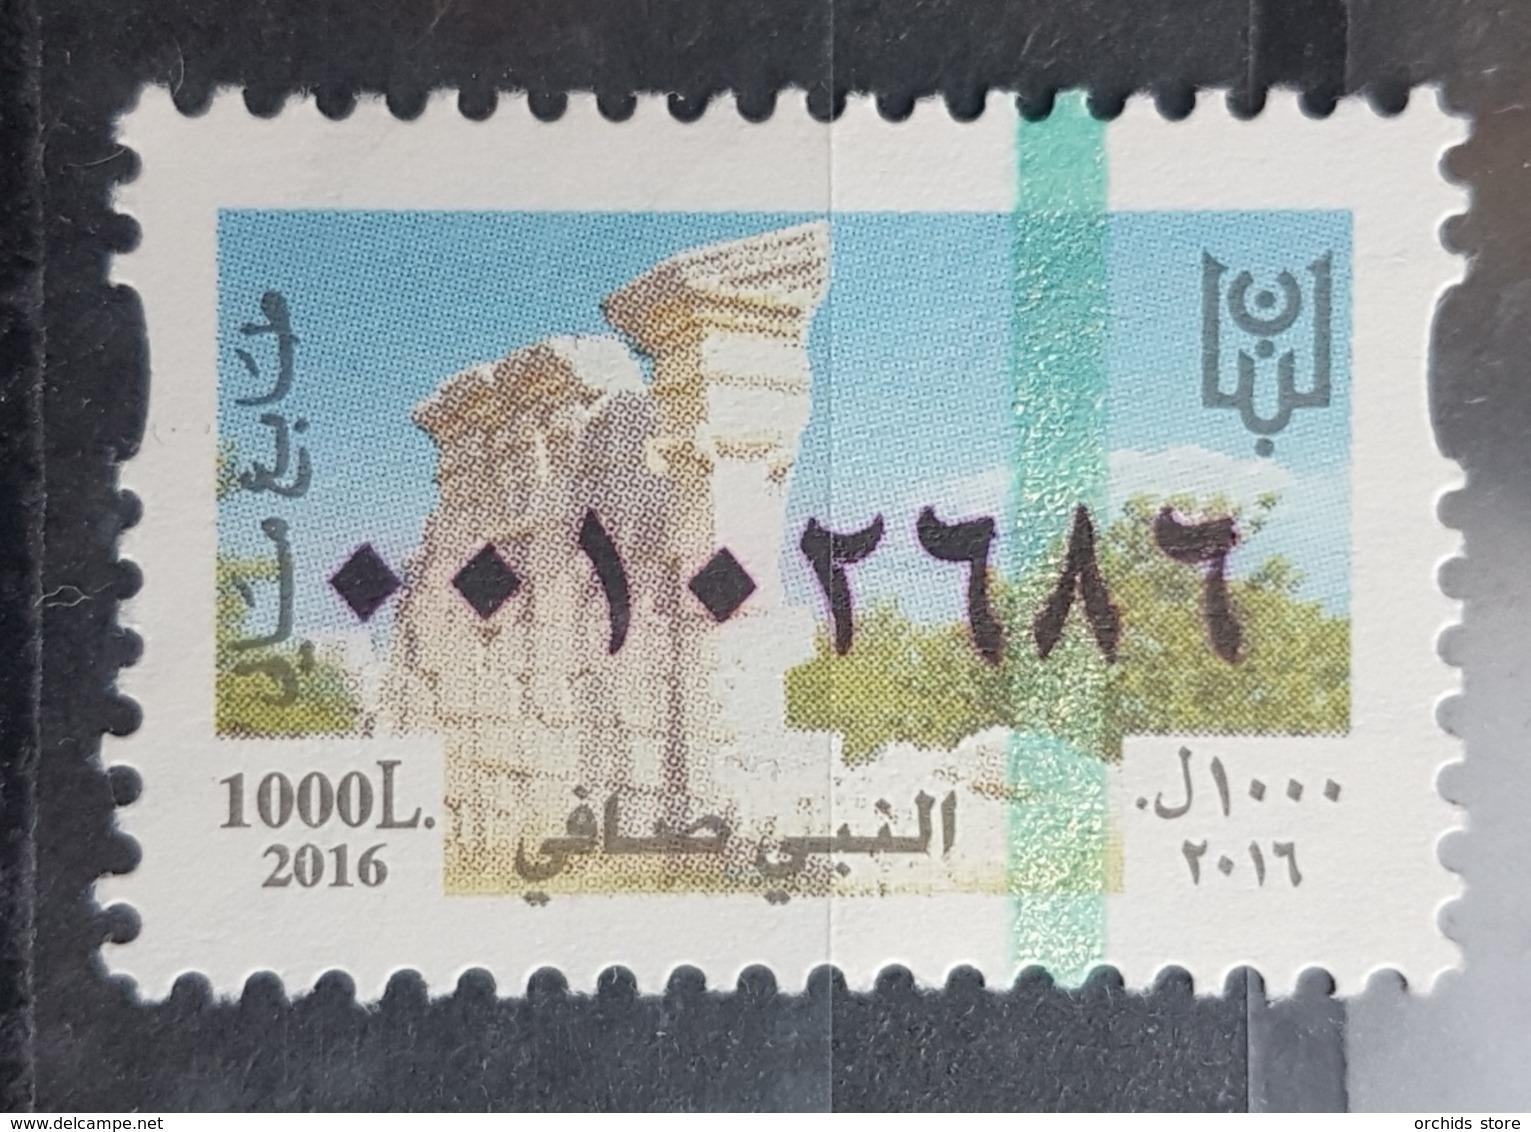 Lebanon 2016 MNH Fiscal Revenue Stamp - 1000L - Nabi Safi - Lebanon